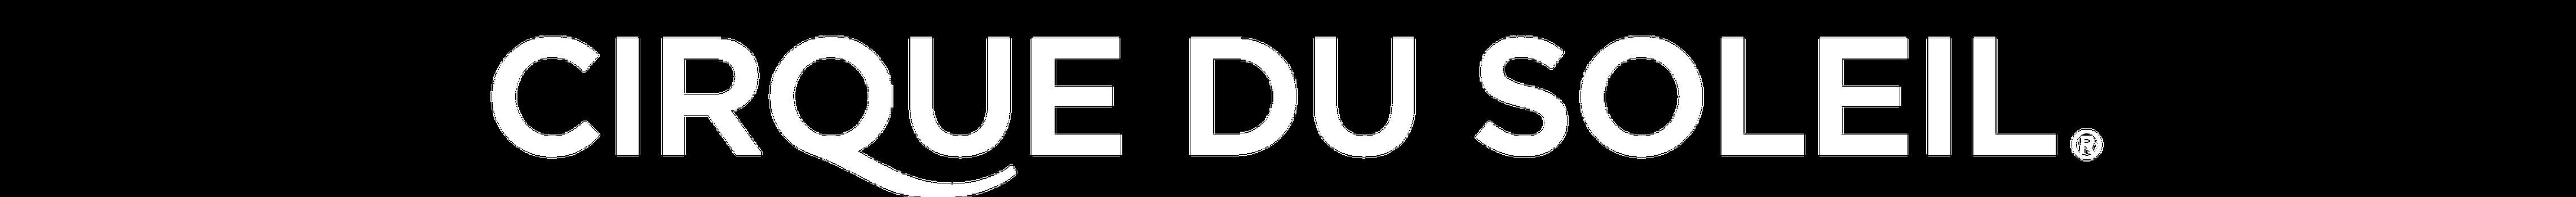 Cirque Du Soleil FR logo